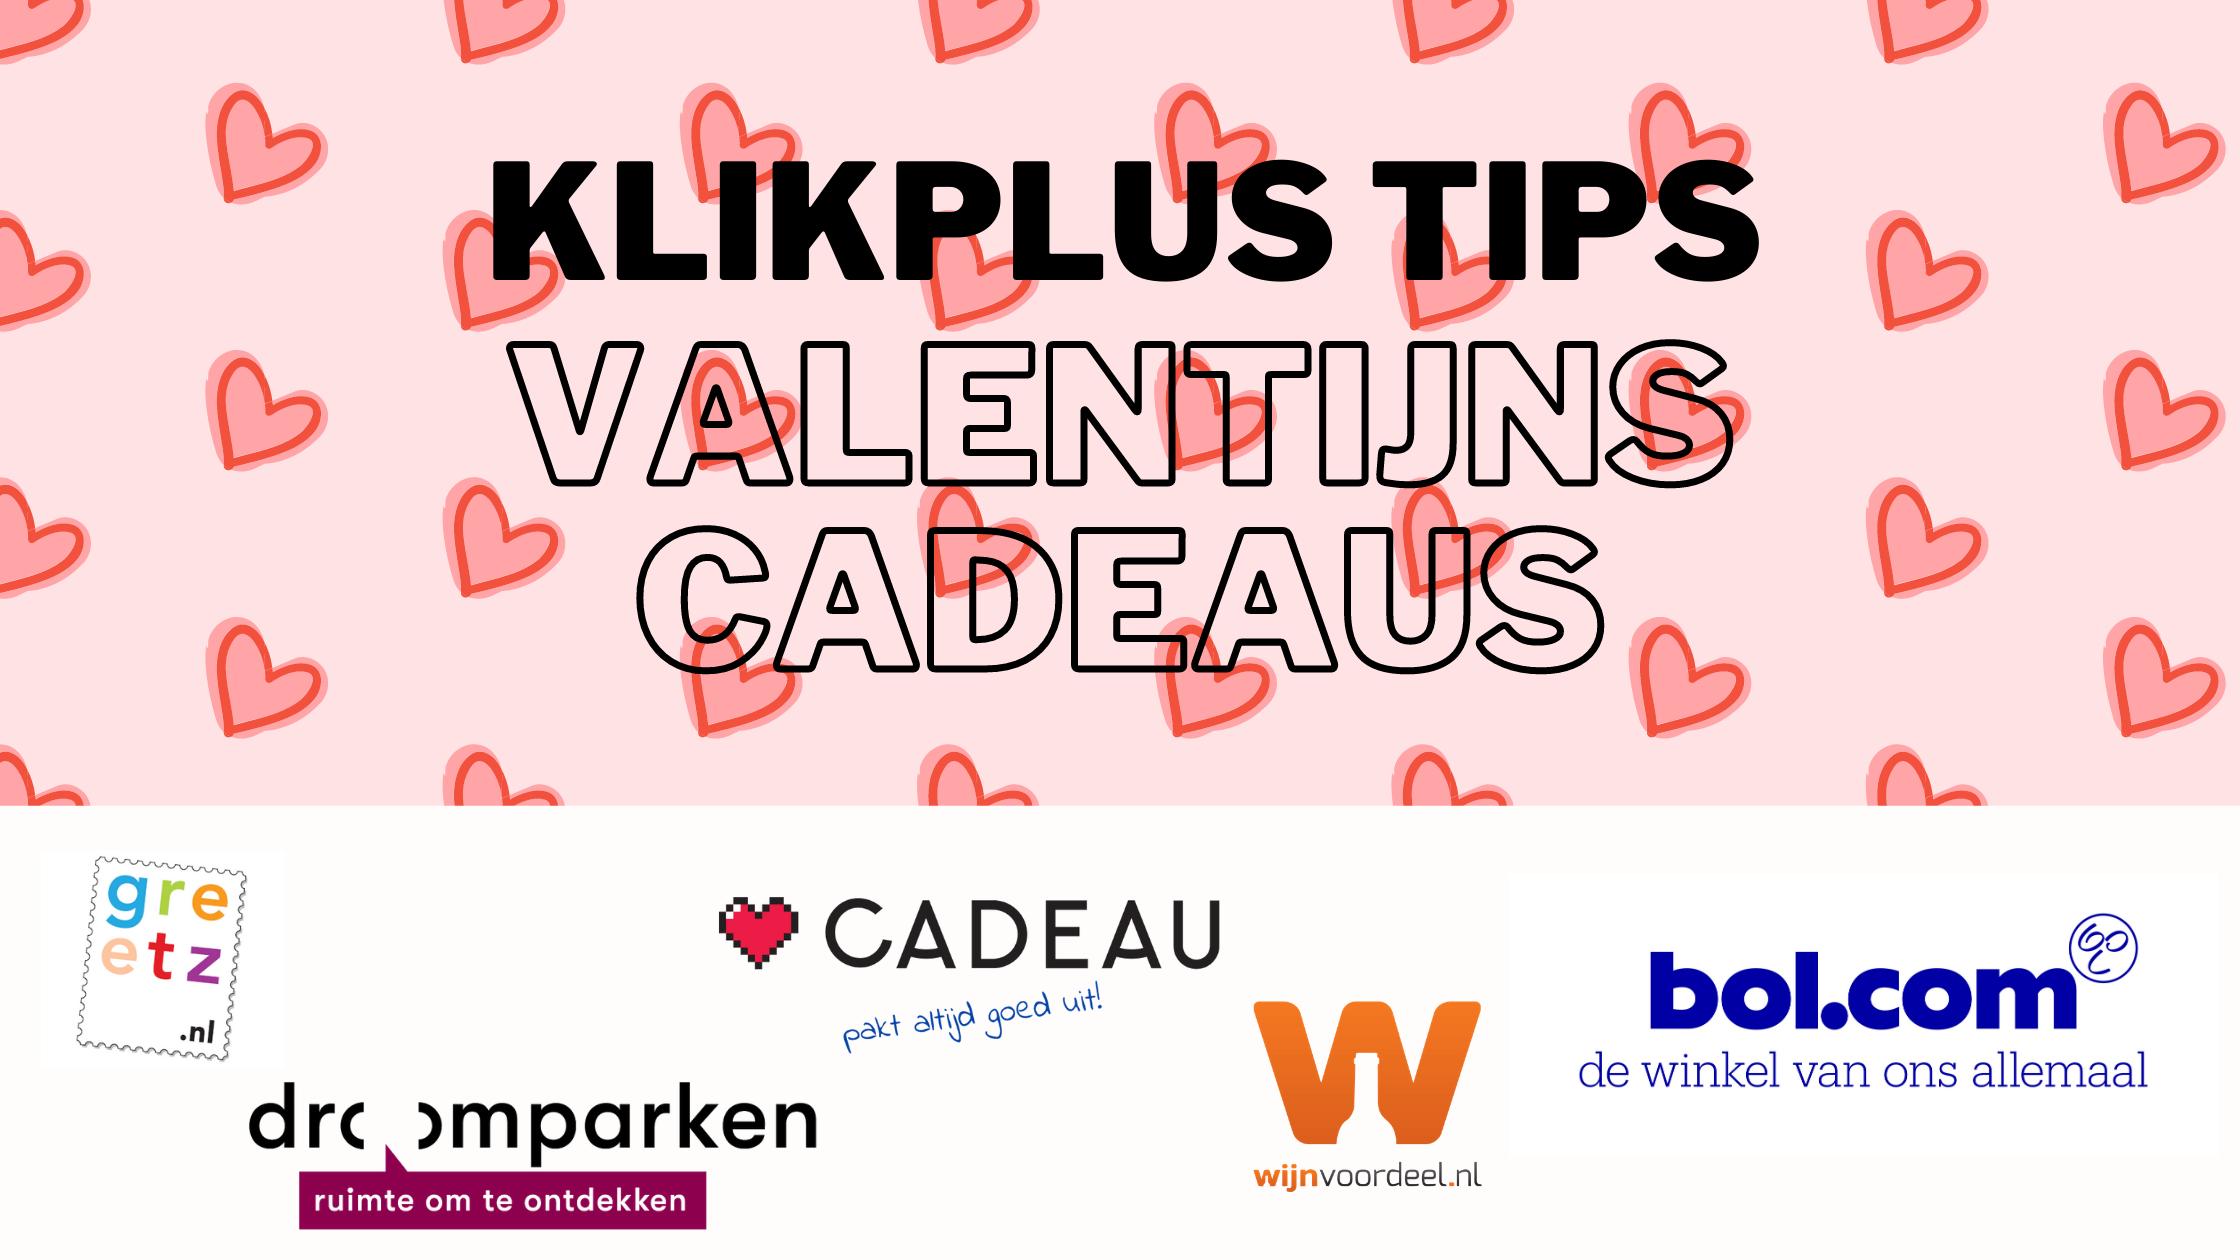 Top 5 Valentijnscadeaus